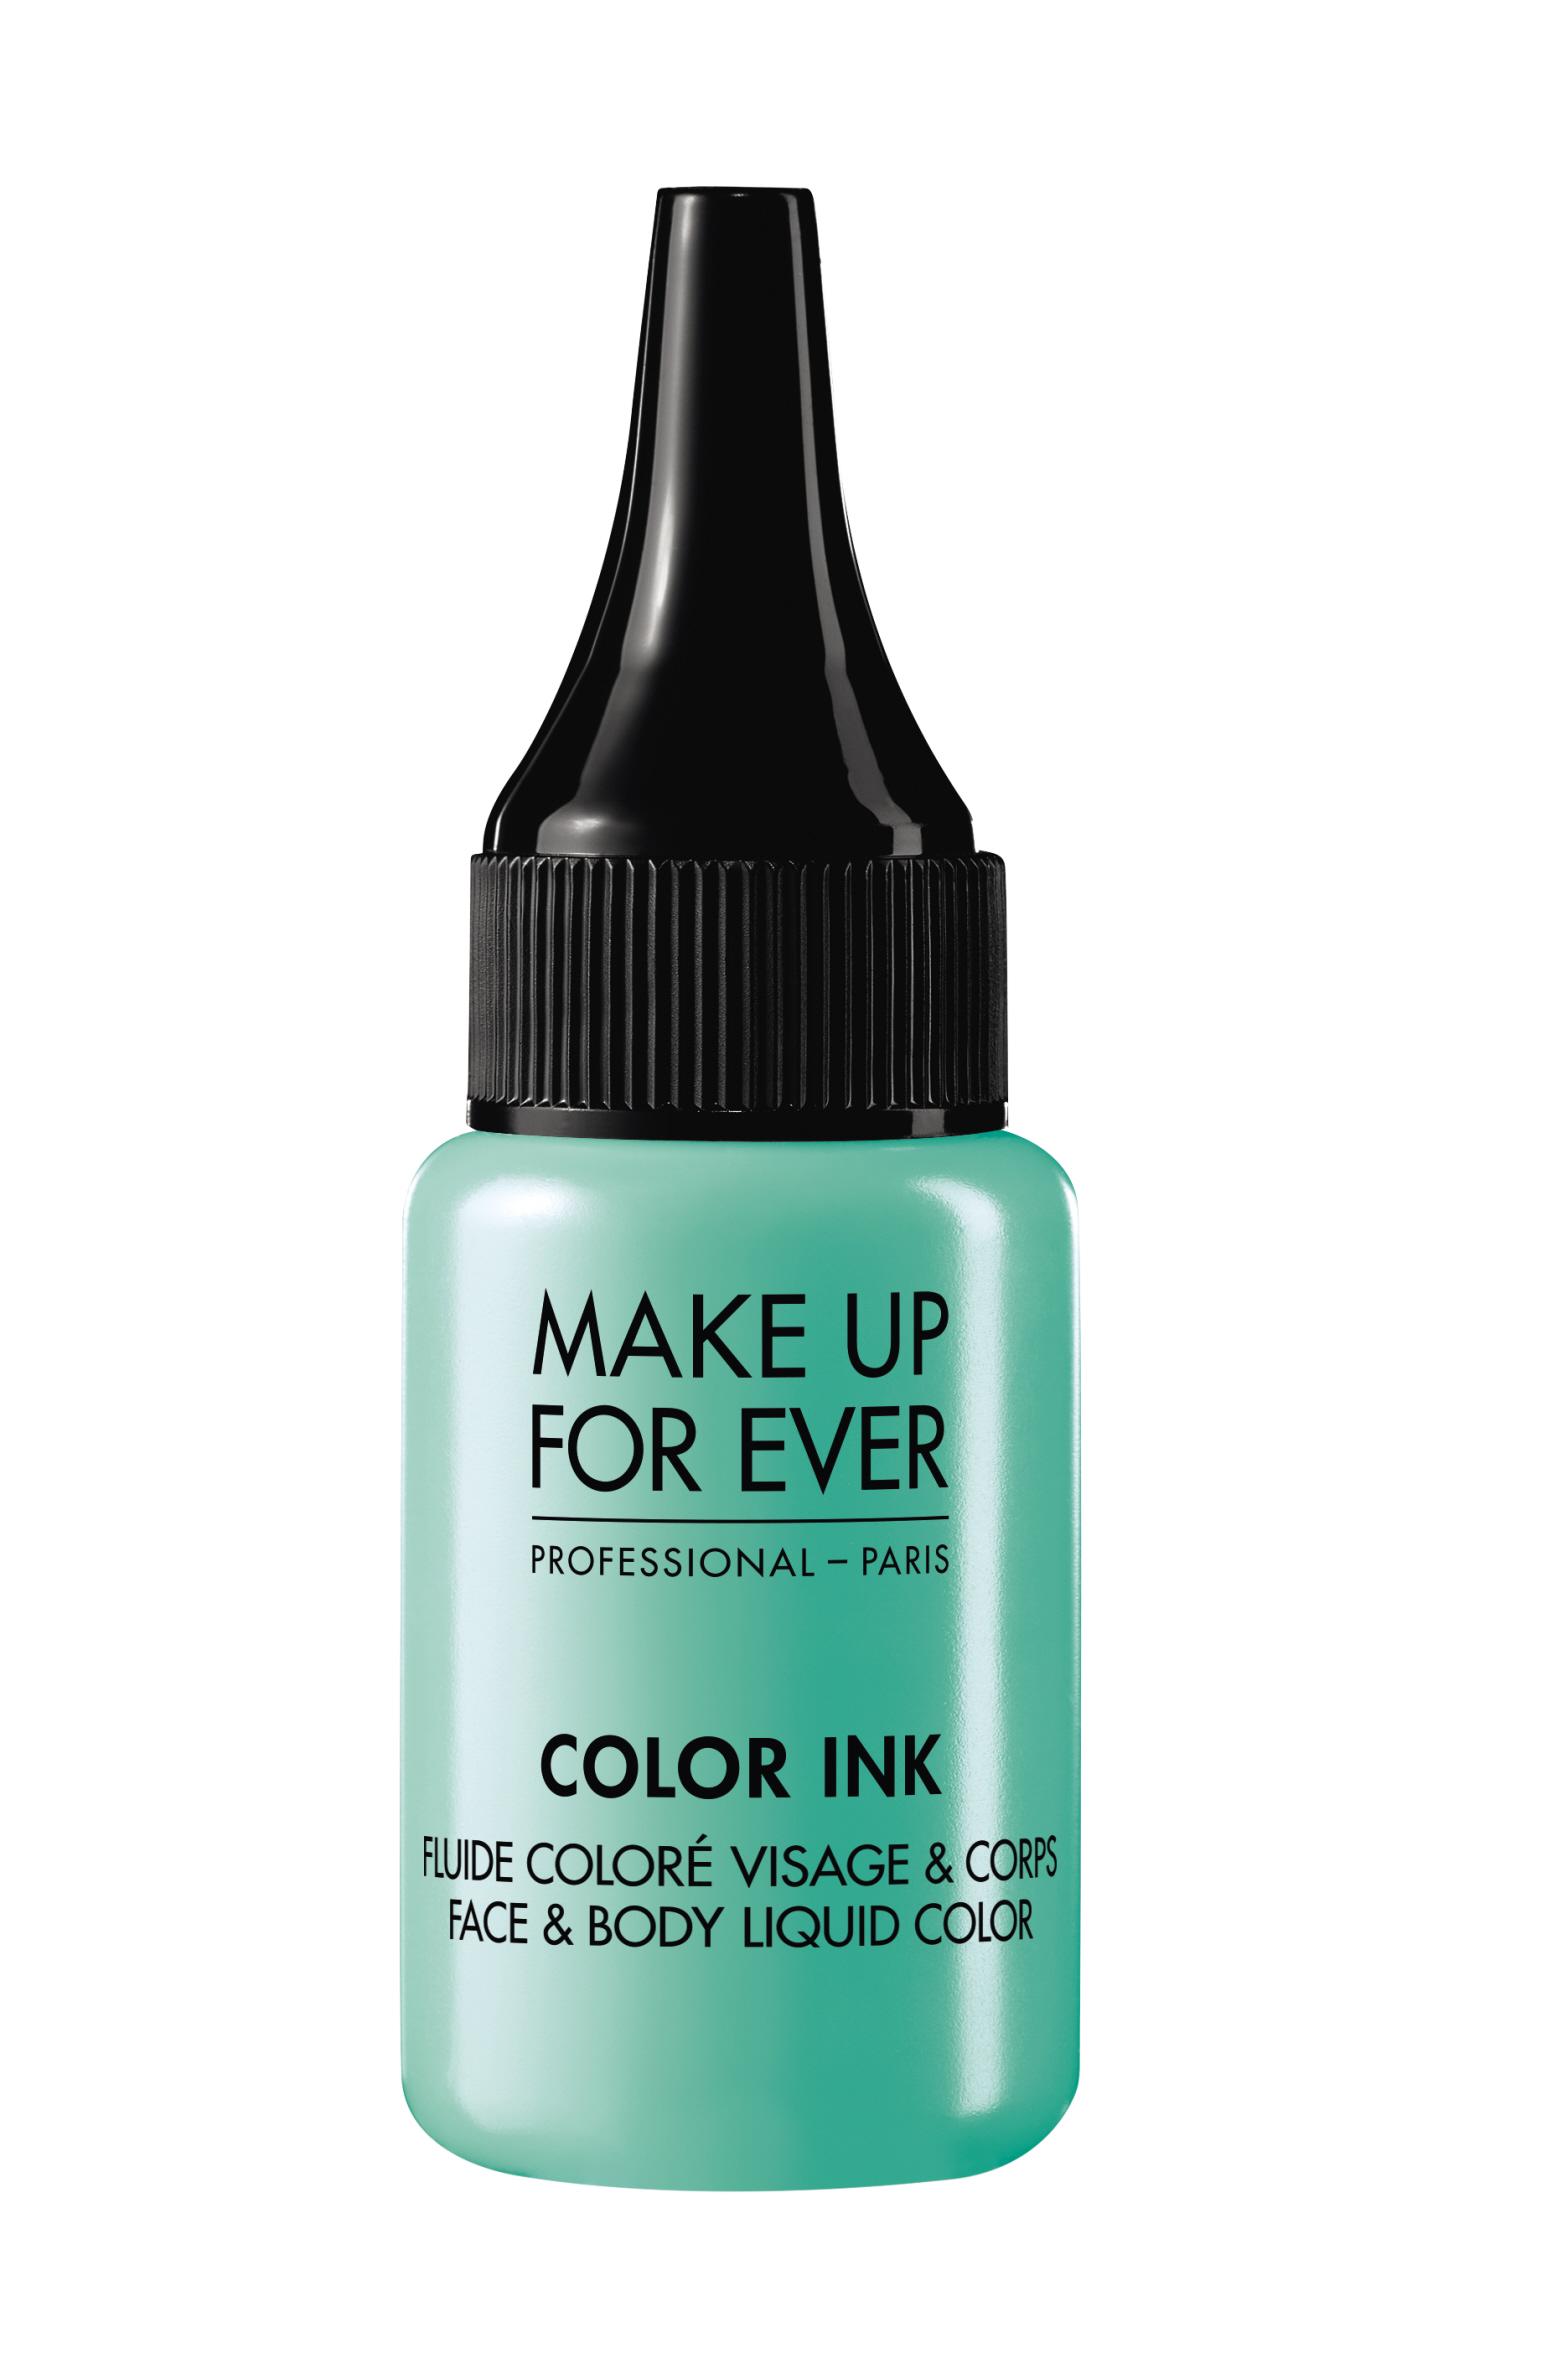 Цветная краска / Color Ink / Face & Body Liquid Color 15 мл (M204 Бирюзовый) Make Up For Ever